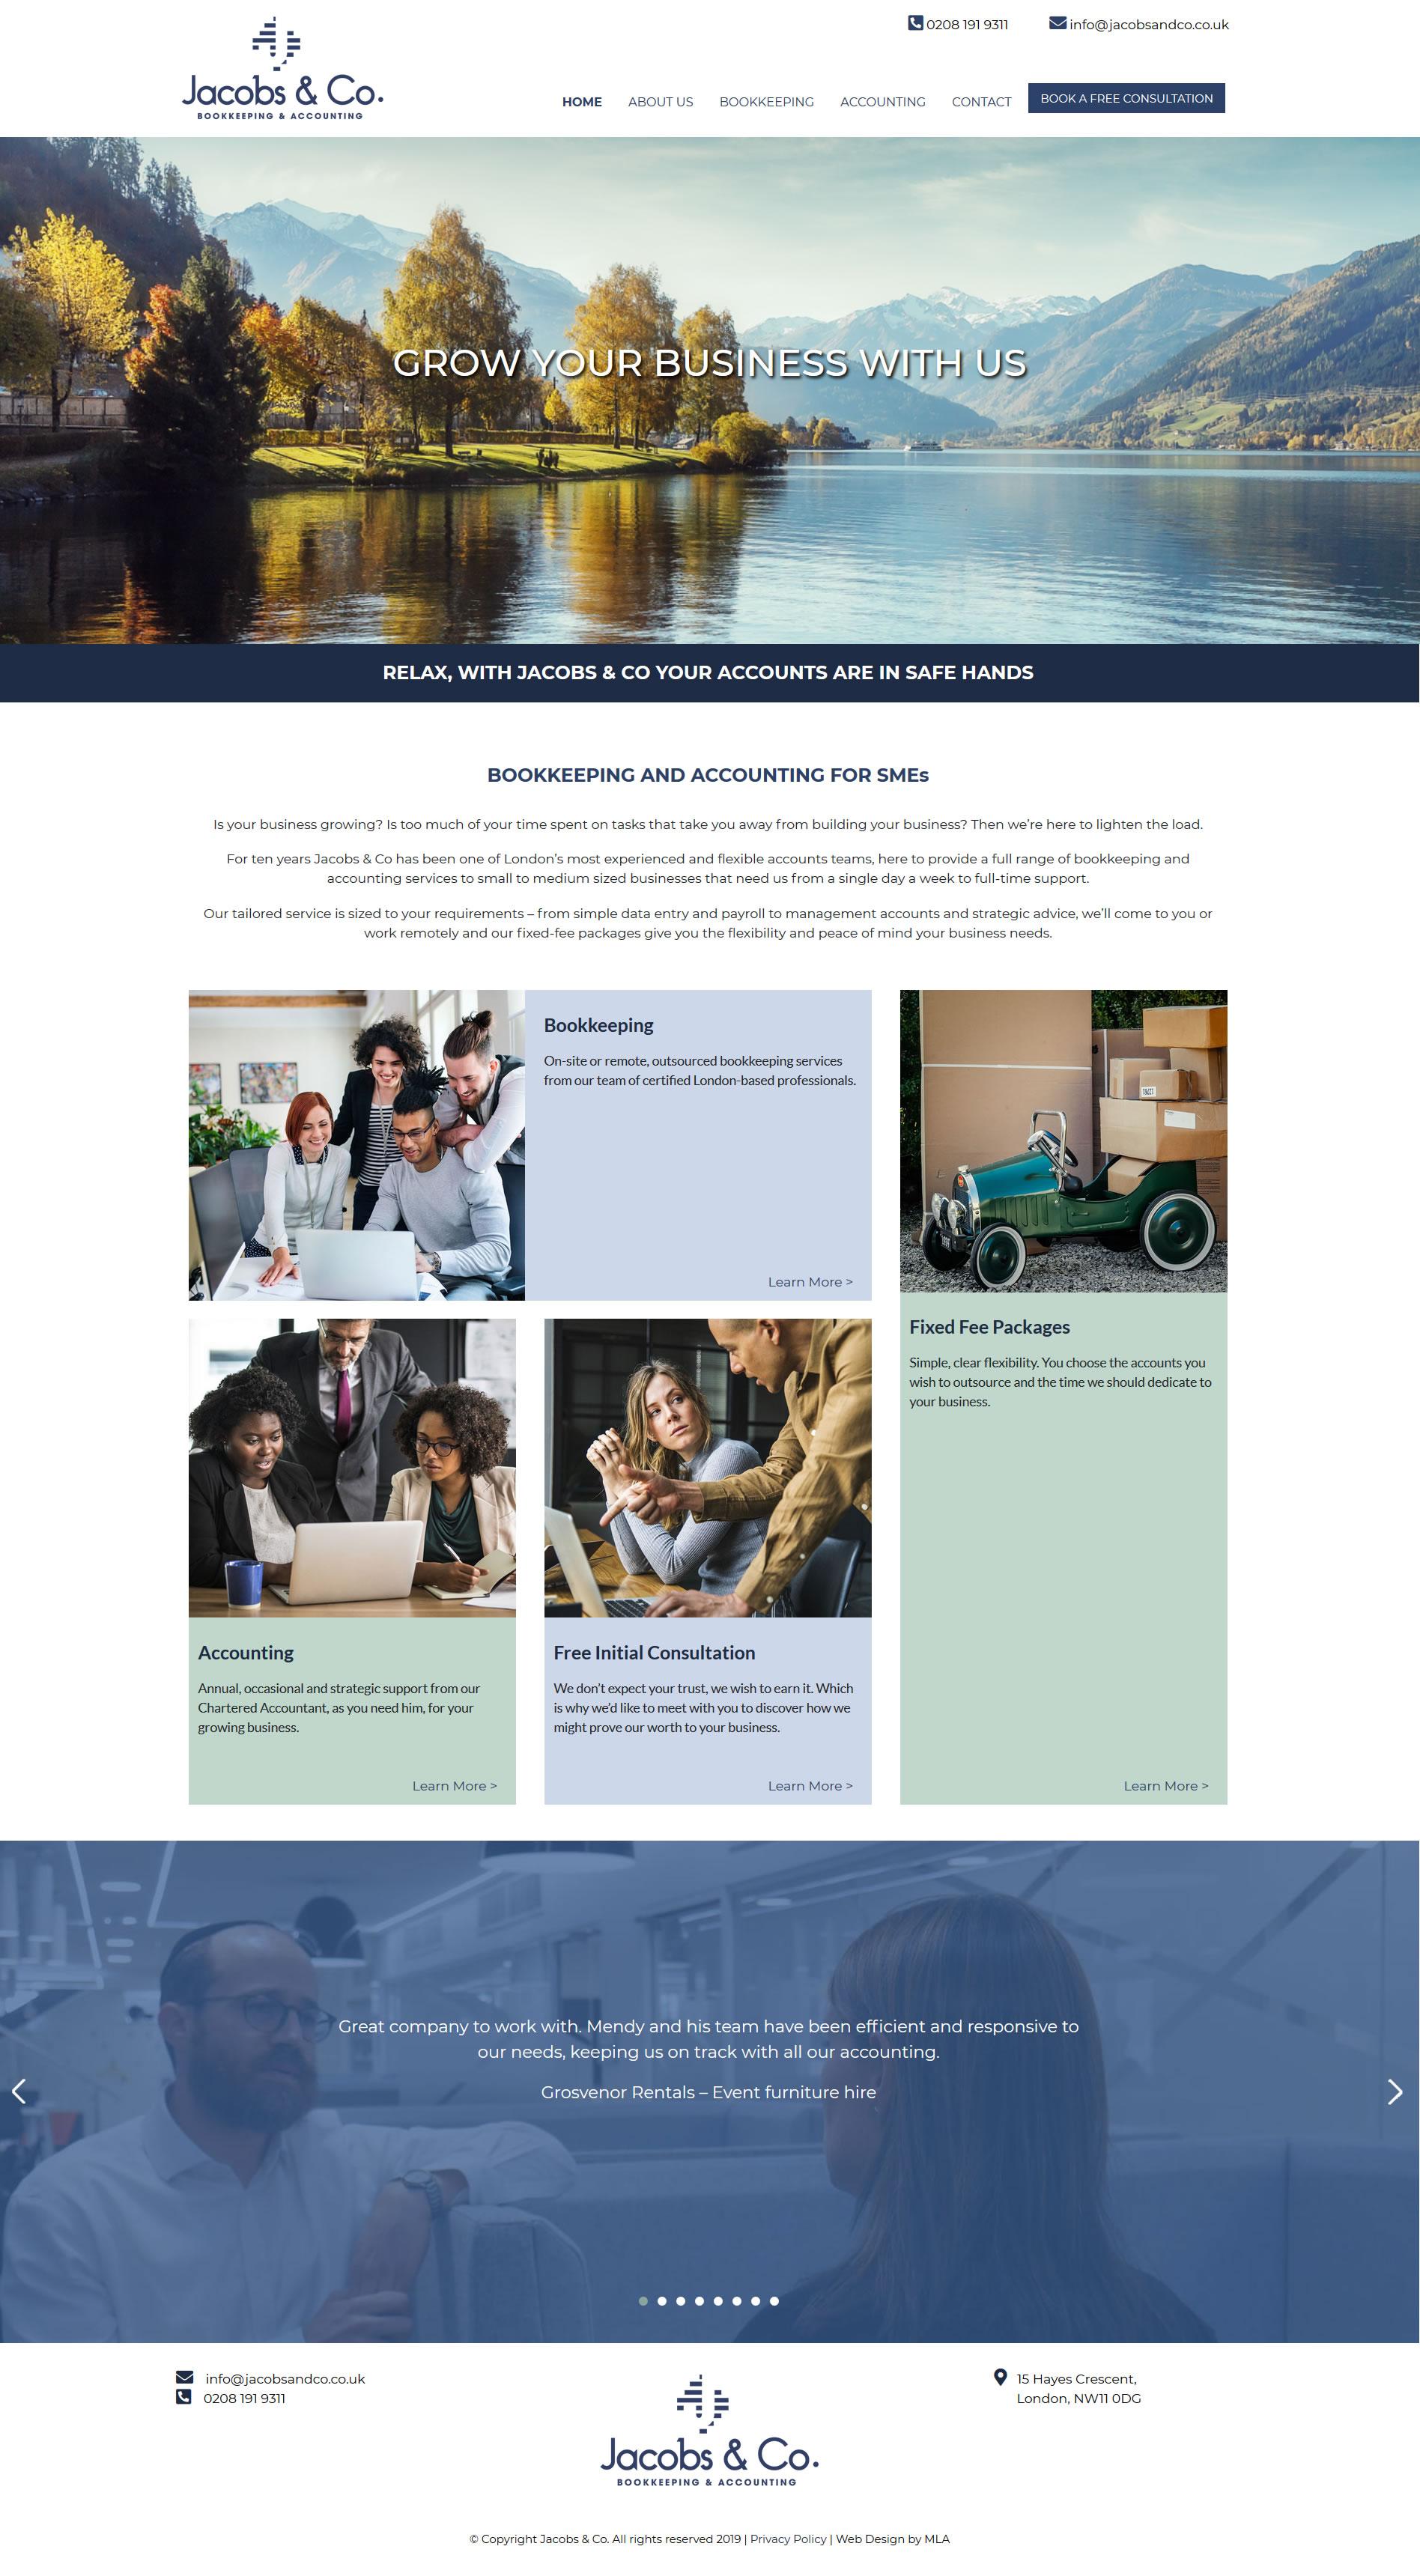 Jacobs and co website design - Website design London - web design agency london